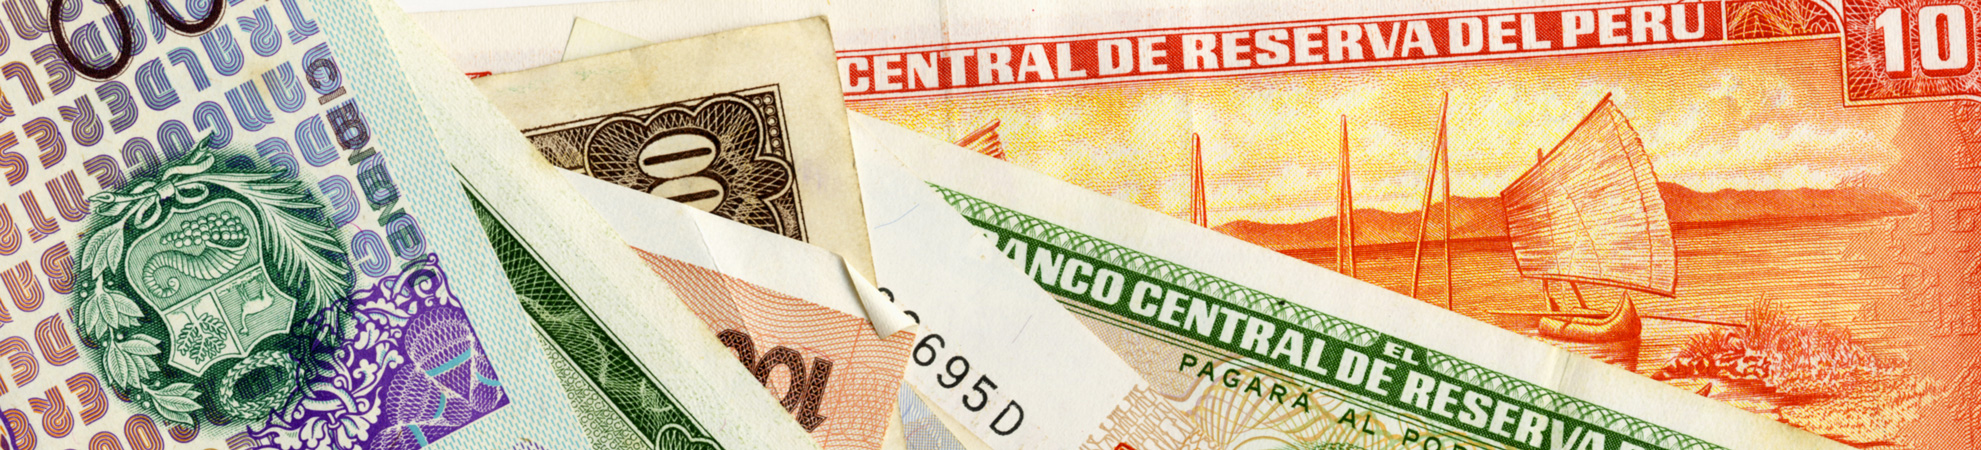 Monnaie au Pérou